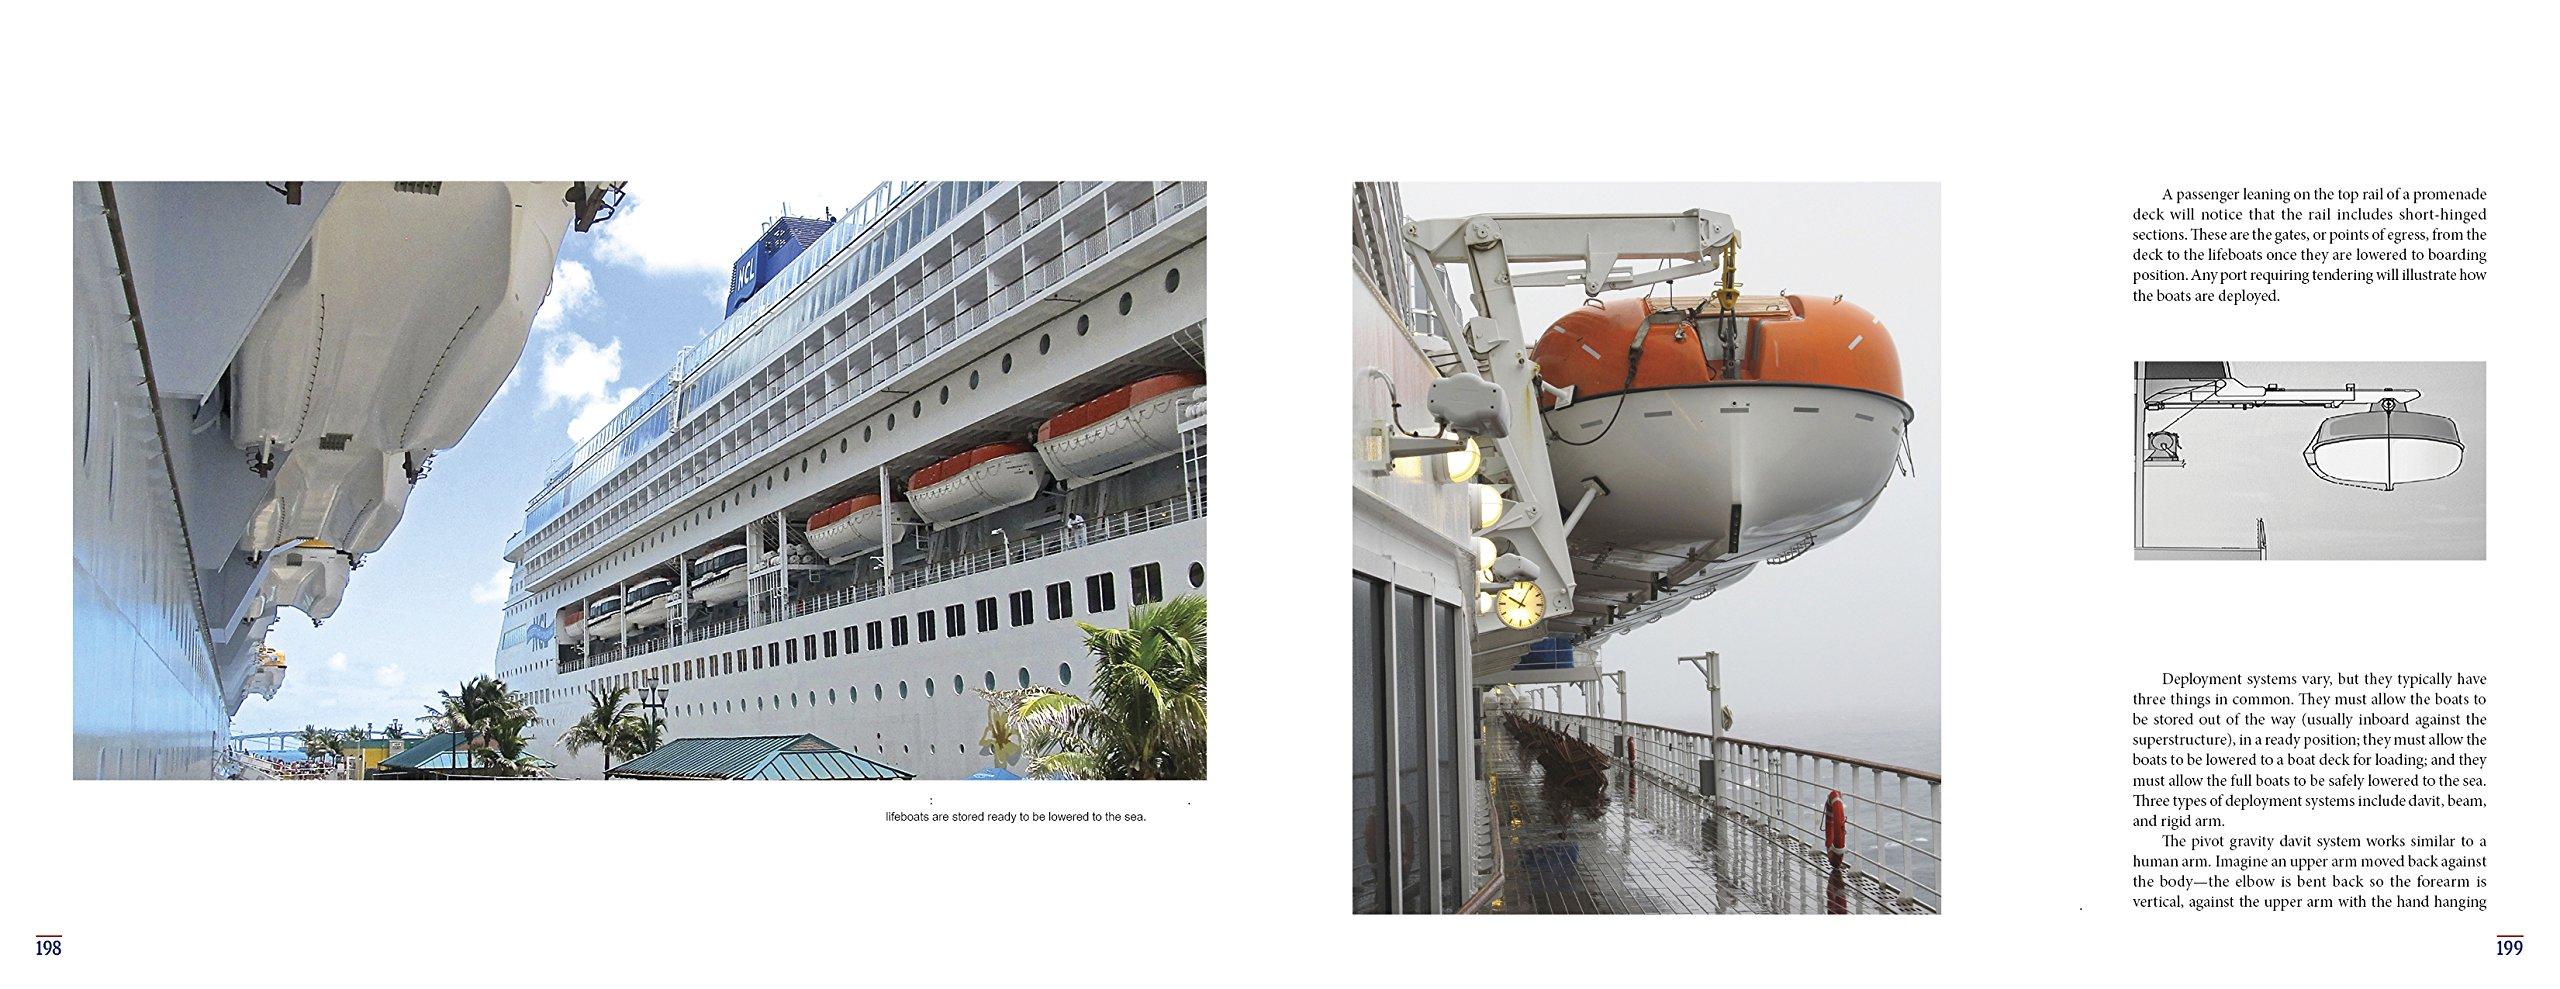 A Cruise Ship Primer: History & Operations: Craig Munsart: 9780870336386:  Amazon.com: Books